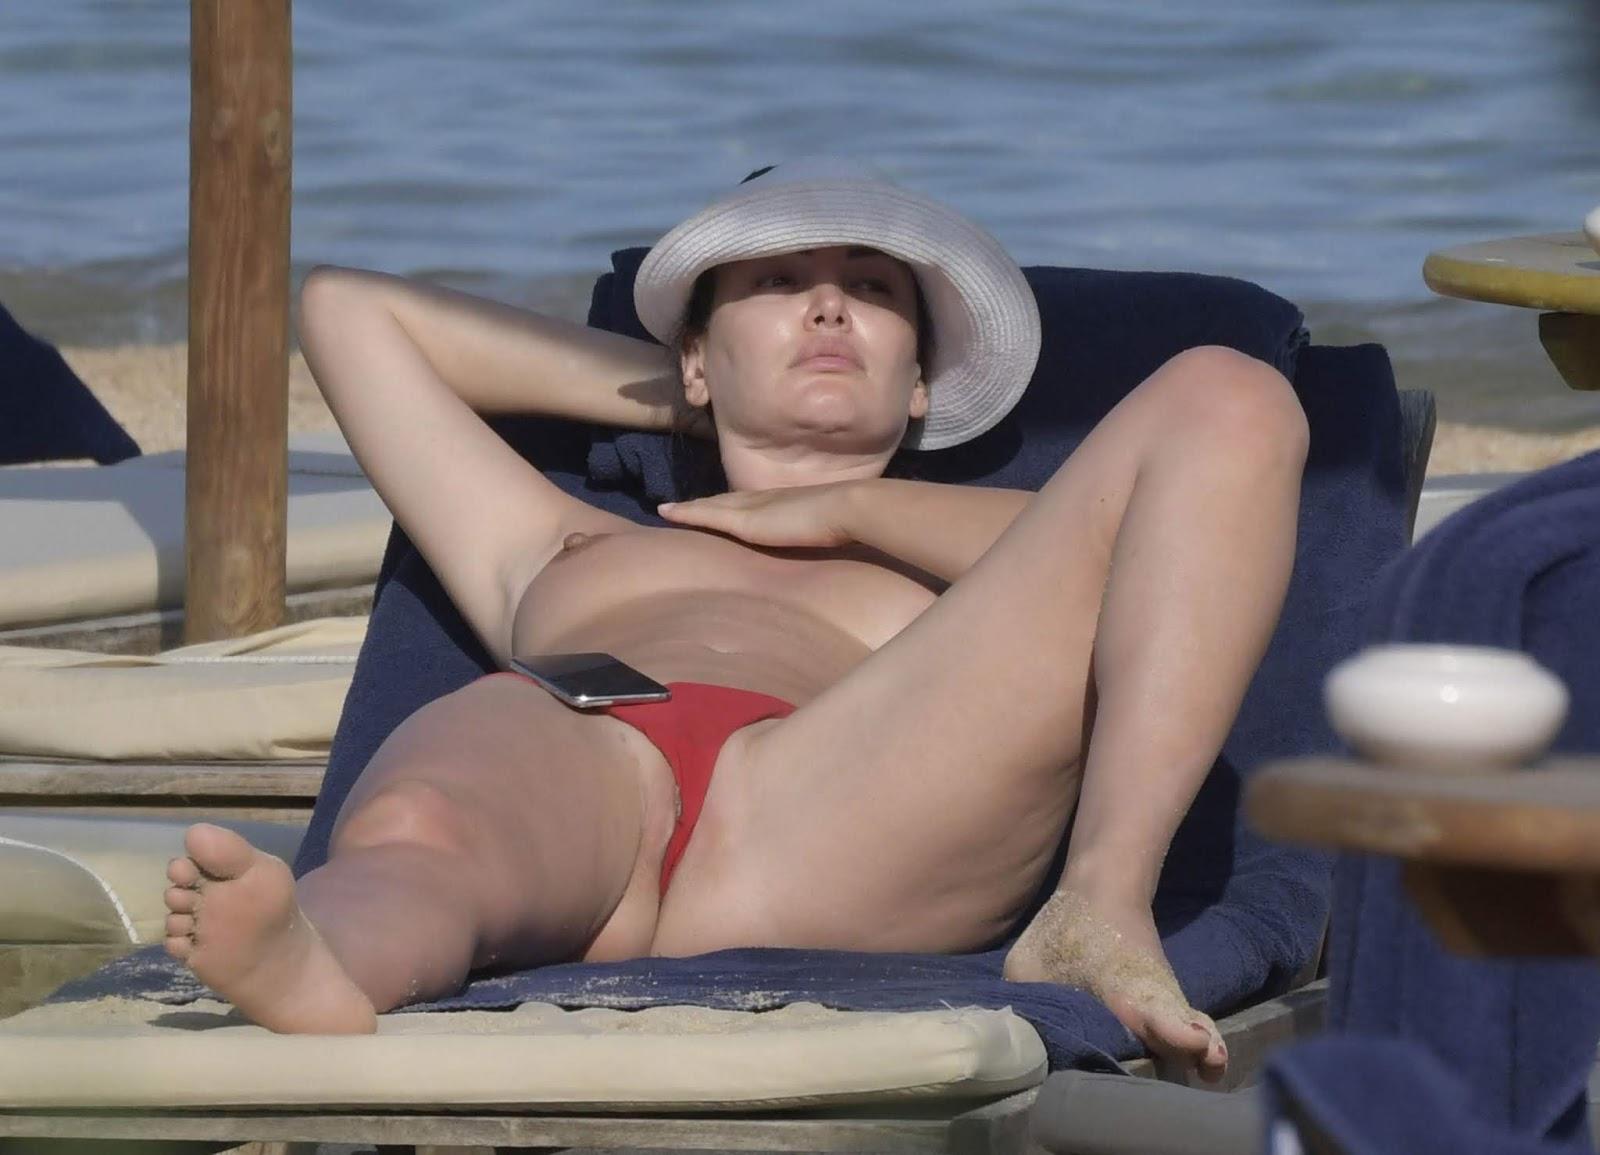 Bleona-Qereti-Topless-And-Lip-Slip-On-The-Beach-y6u7w9lfni.jpg